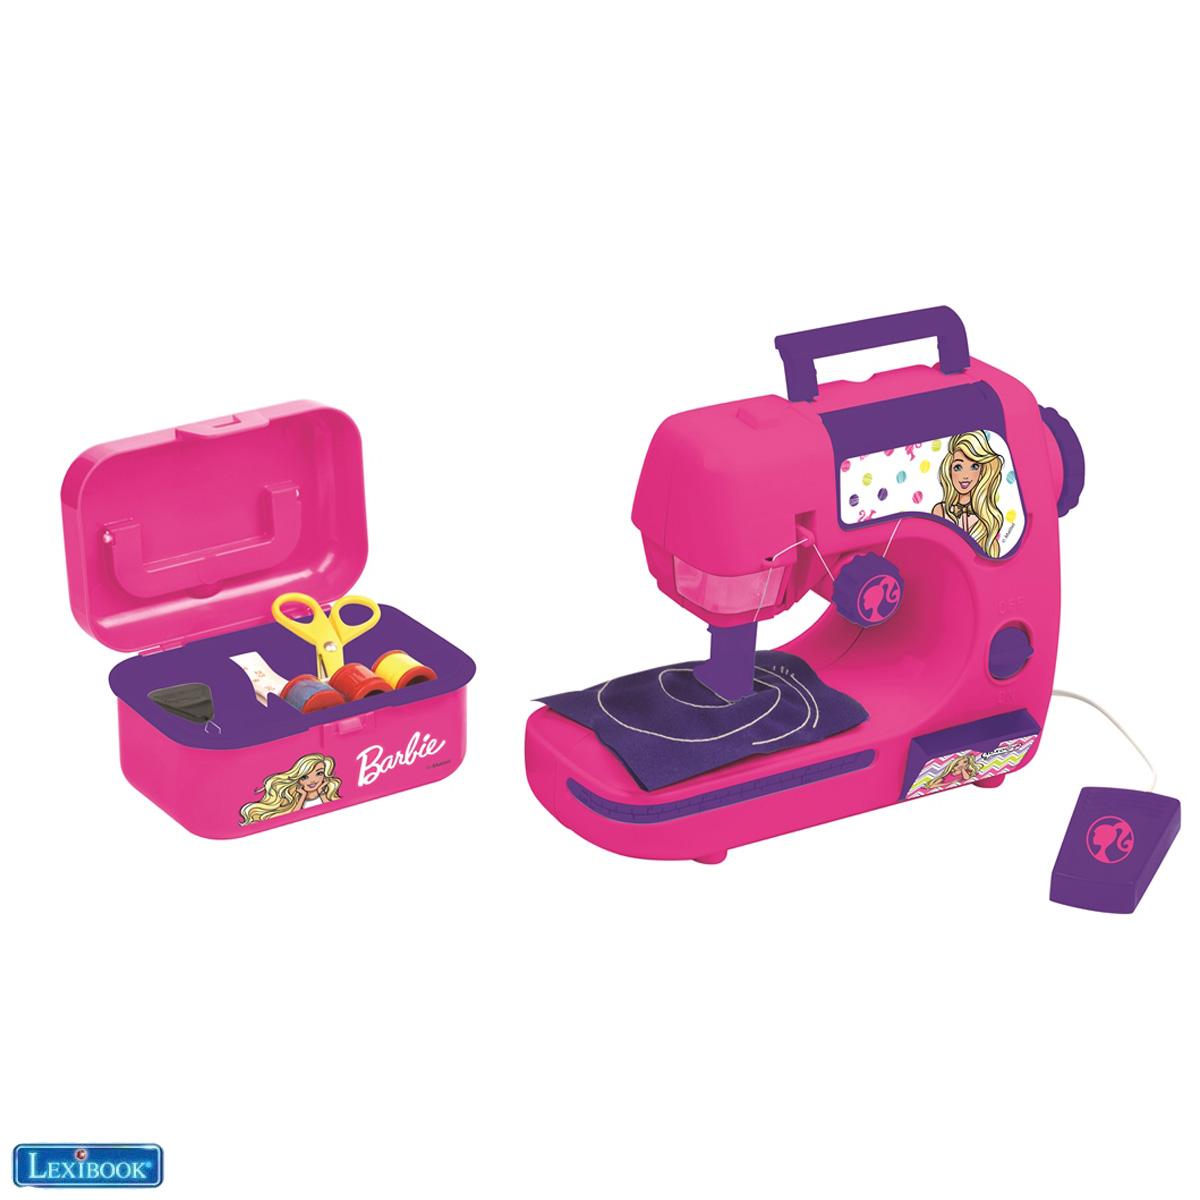 Lexibook - Barbie Sewing Machine (SW100BB)